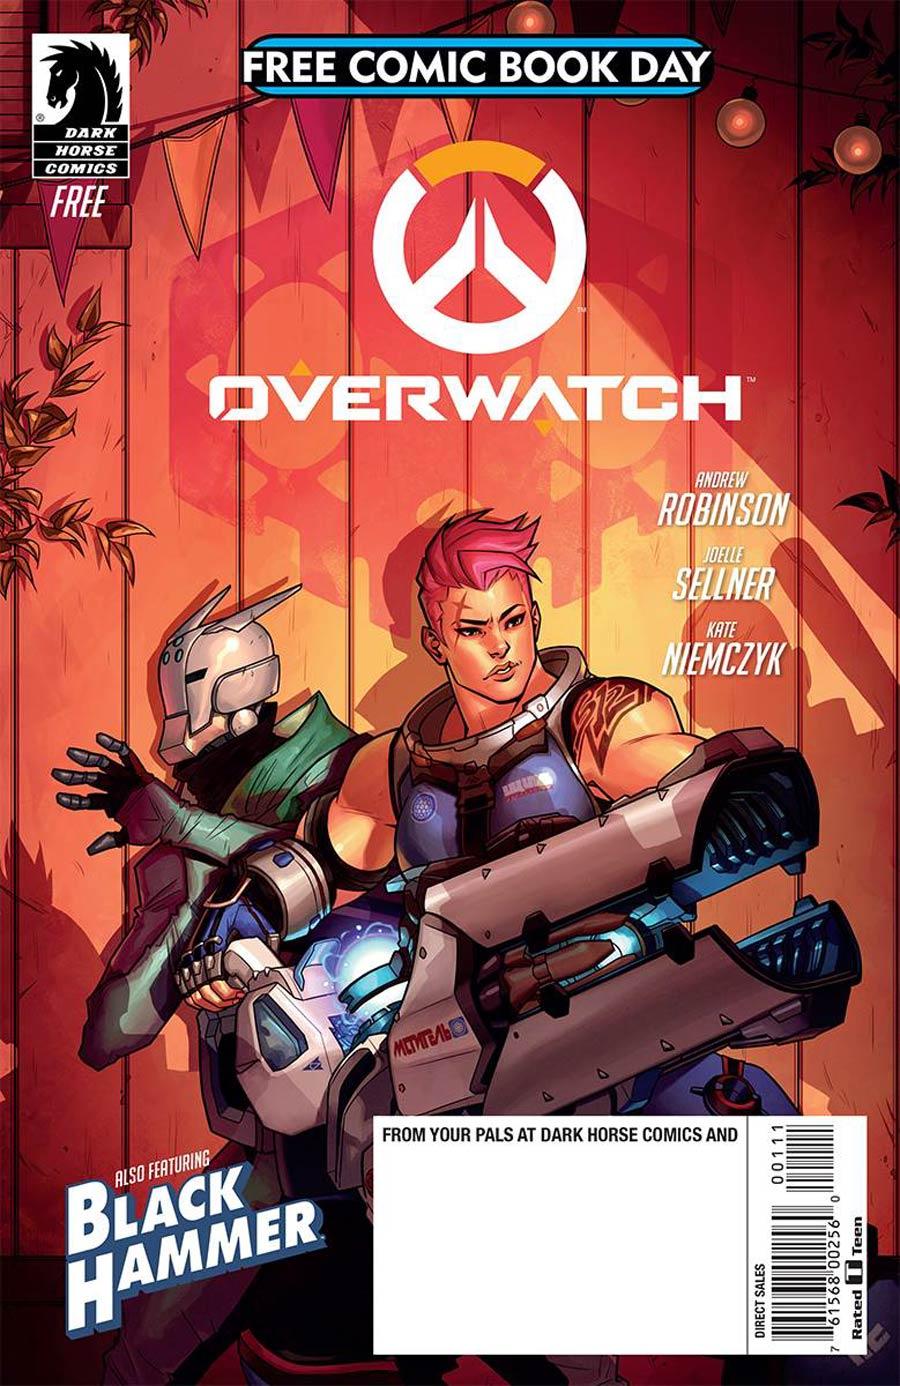 Overwatch & Black Hammer FCBD 2018